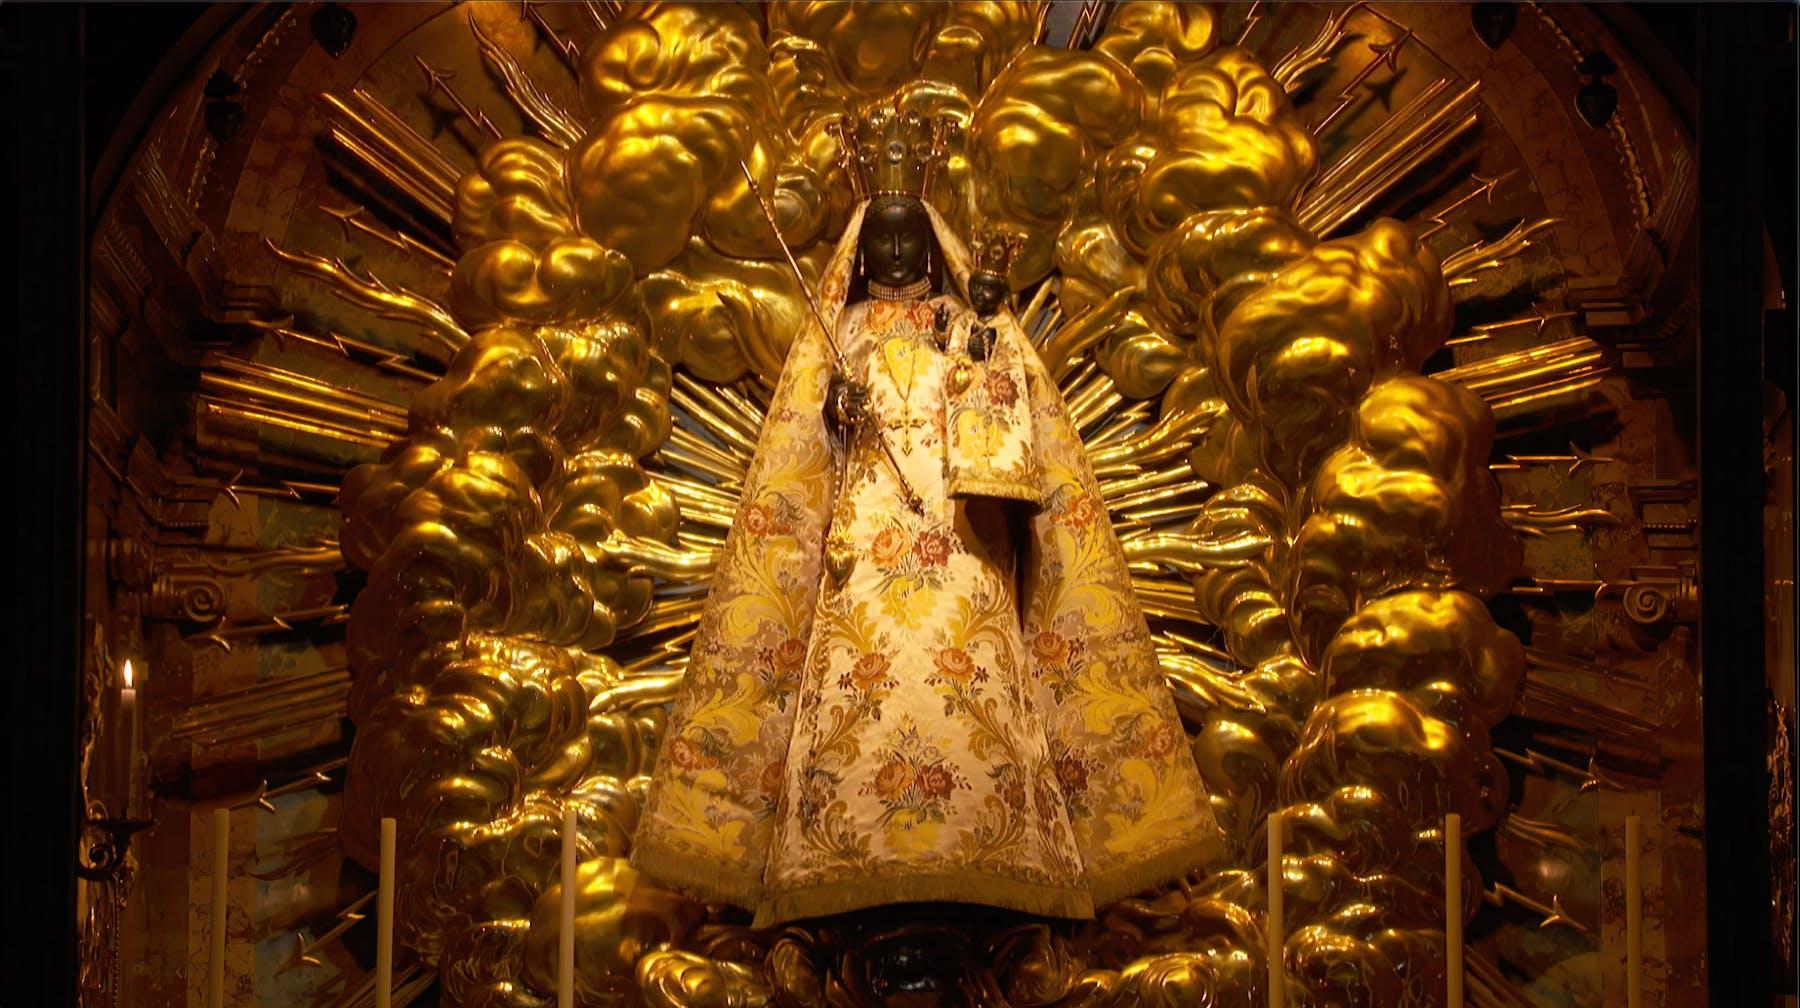 Image 1 de Das katholische Korsett – oder der mühevolle Weg zum Frauenstimmrecht